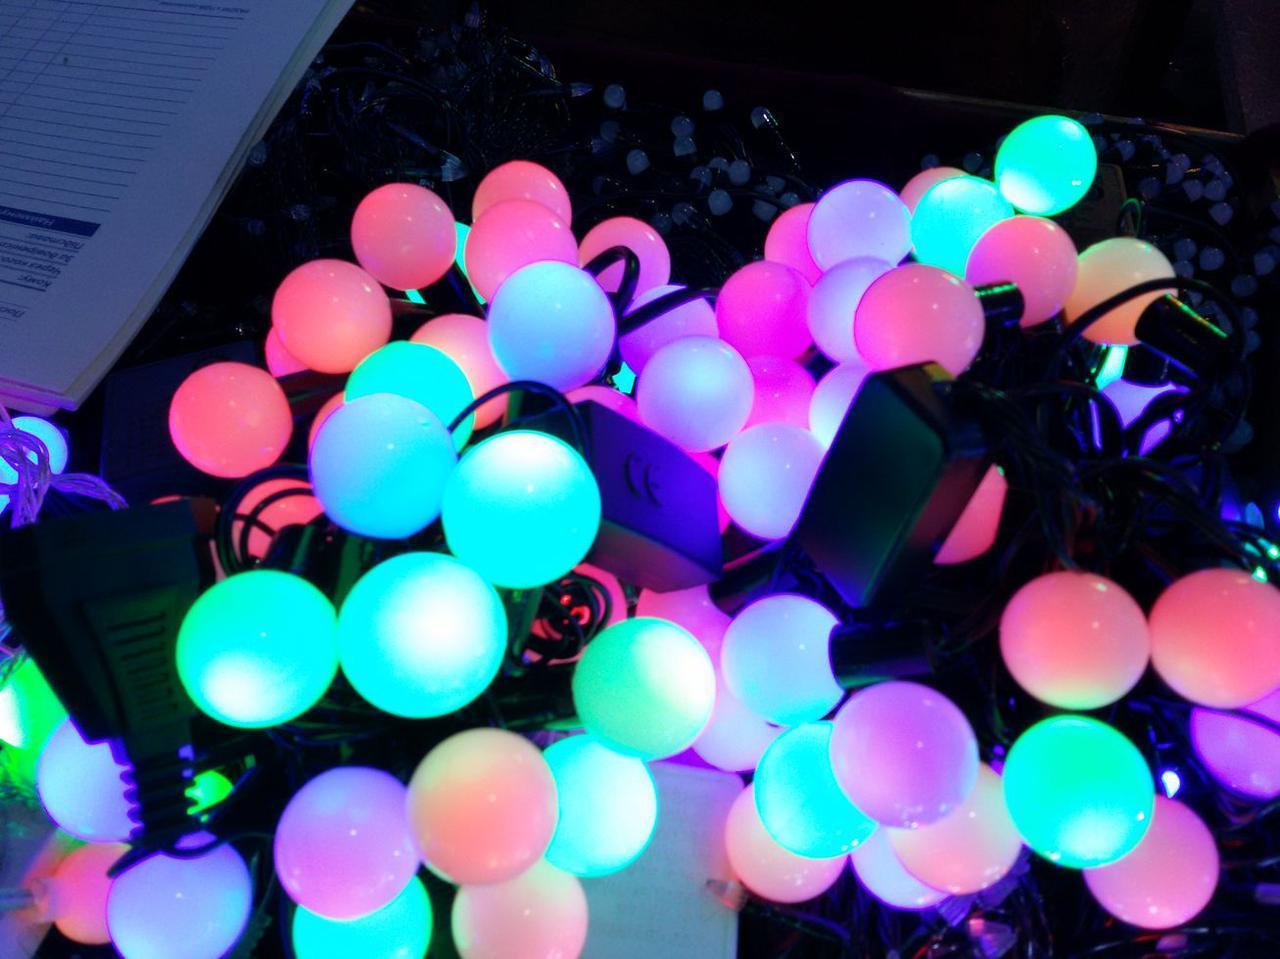 Гирлянда шарики 50 LED 16mm  6 метров разноцветная